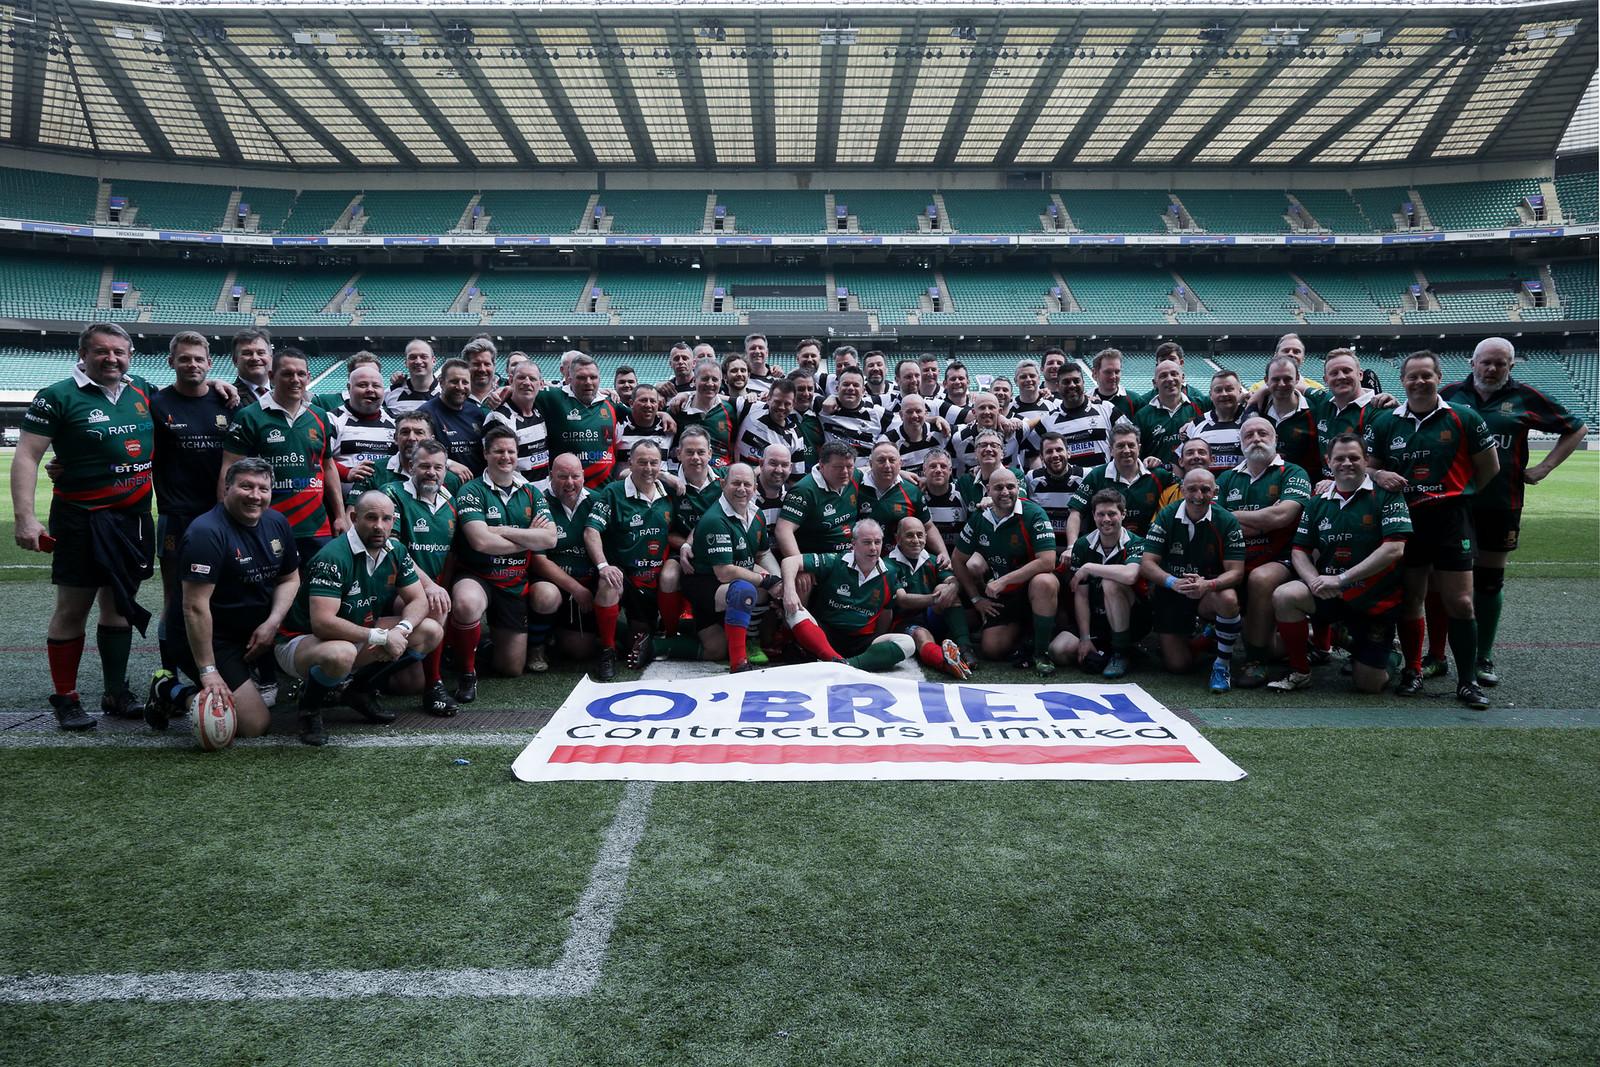 Veseyans Rugby Club Thank O'Brien for Charity Match Sponsorship at Twickenham